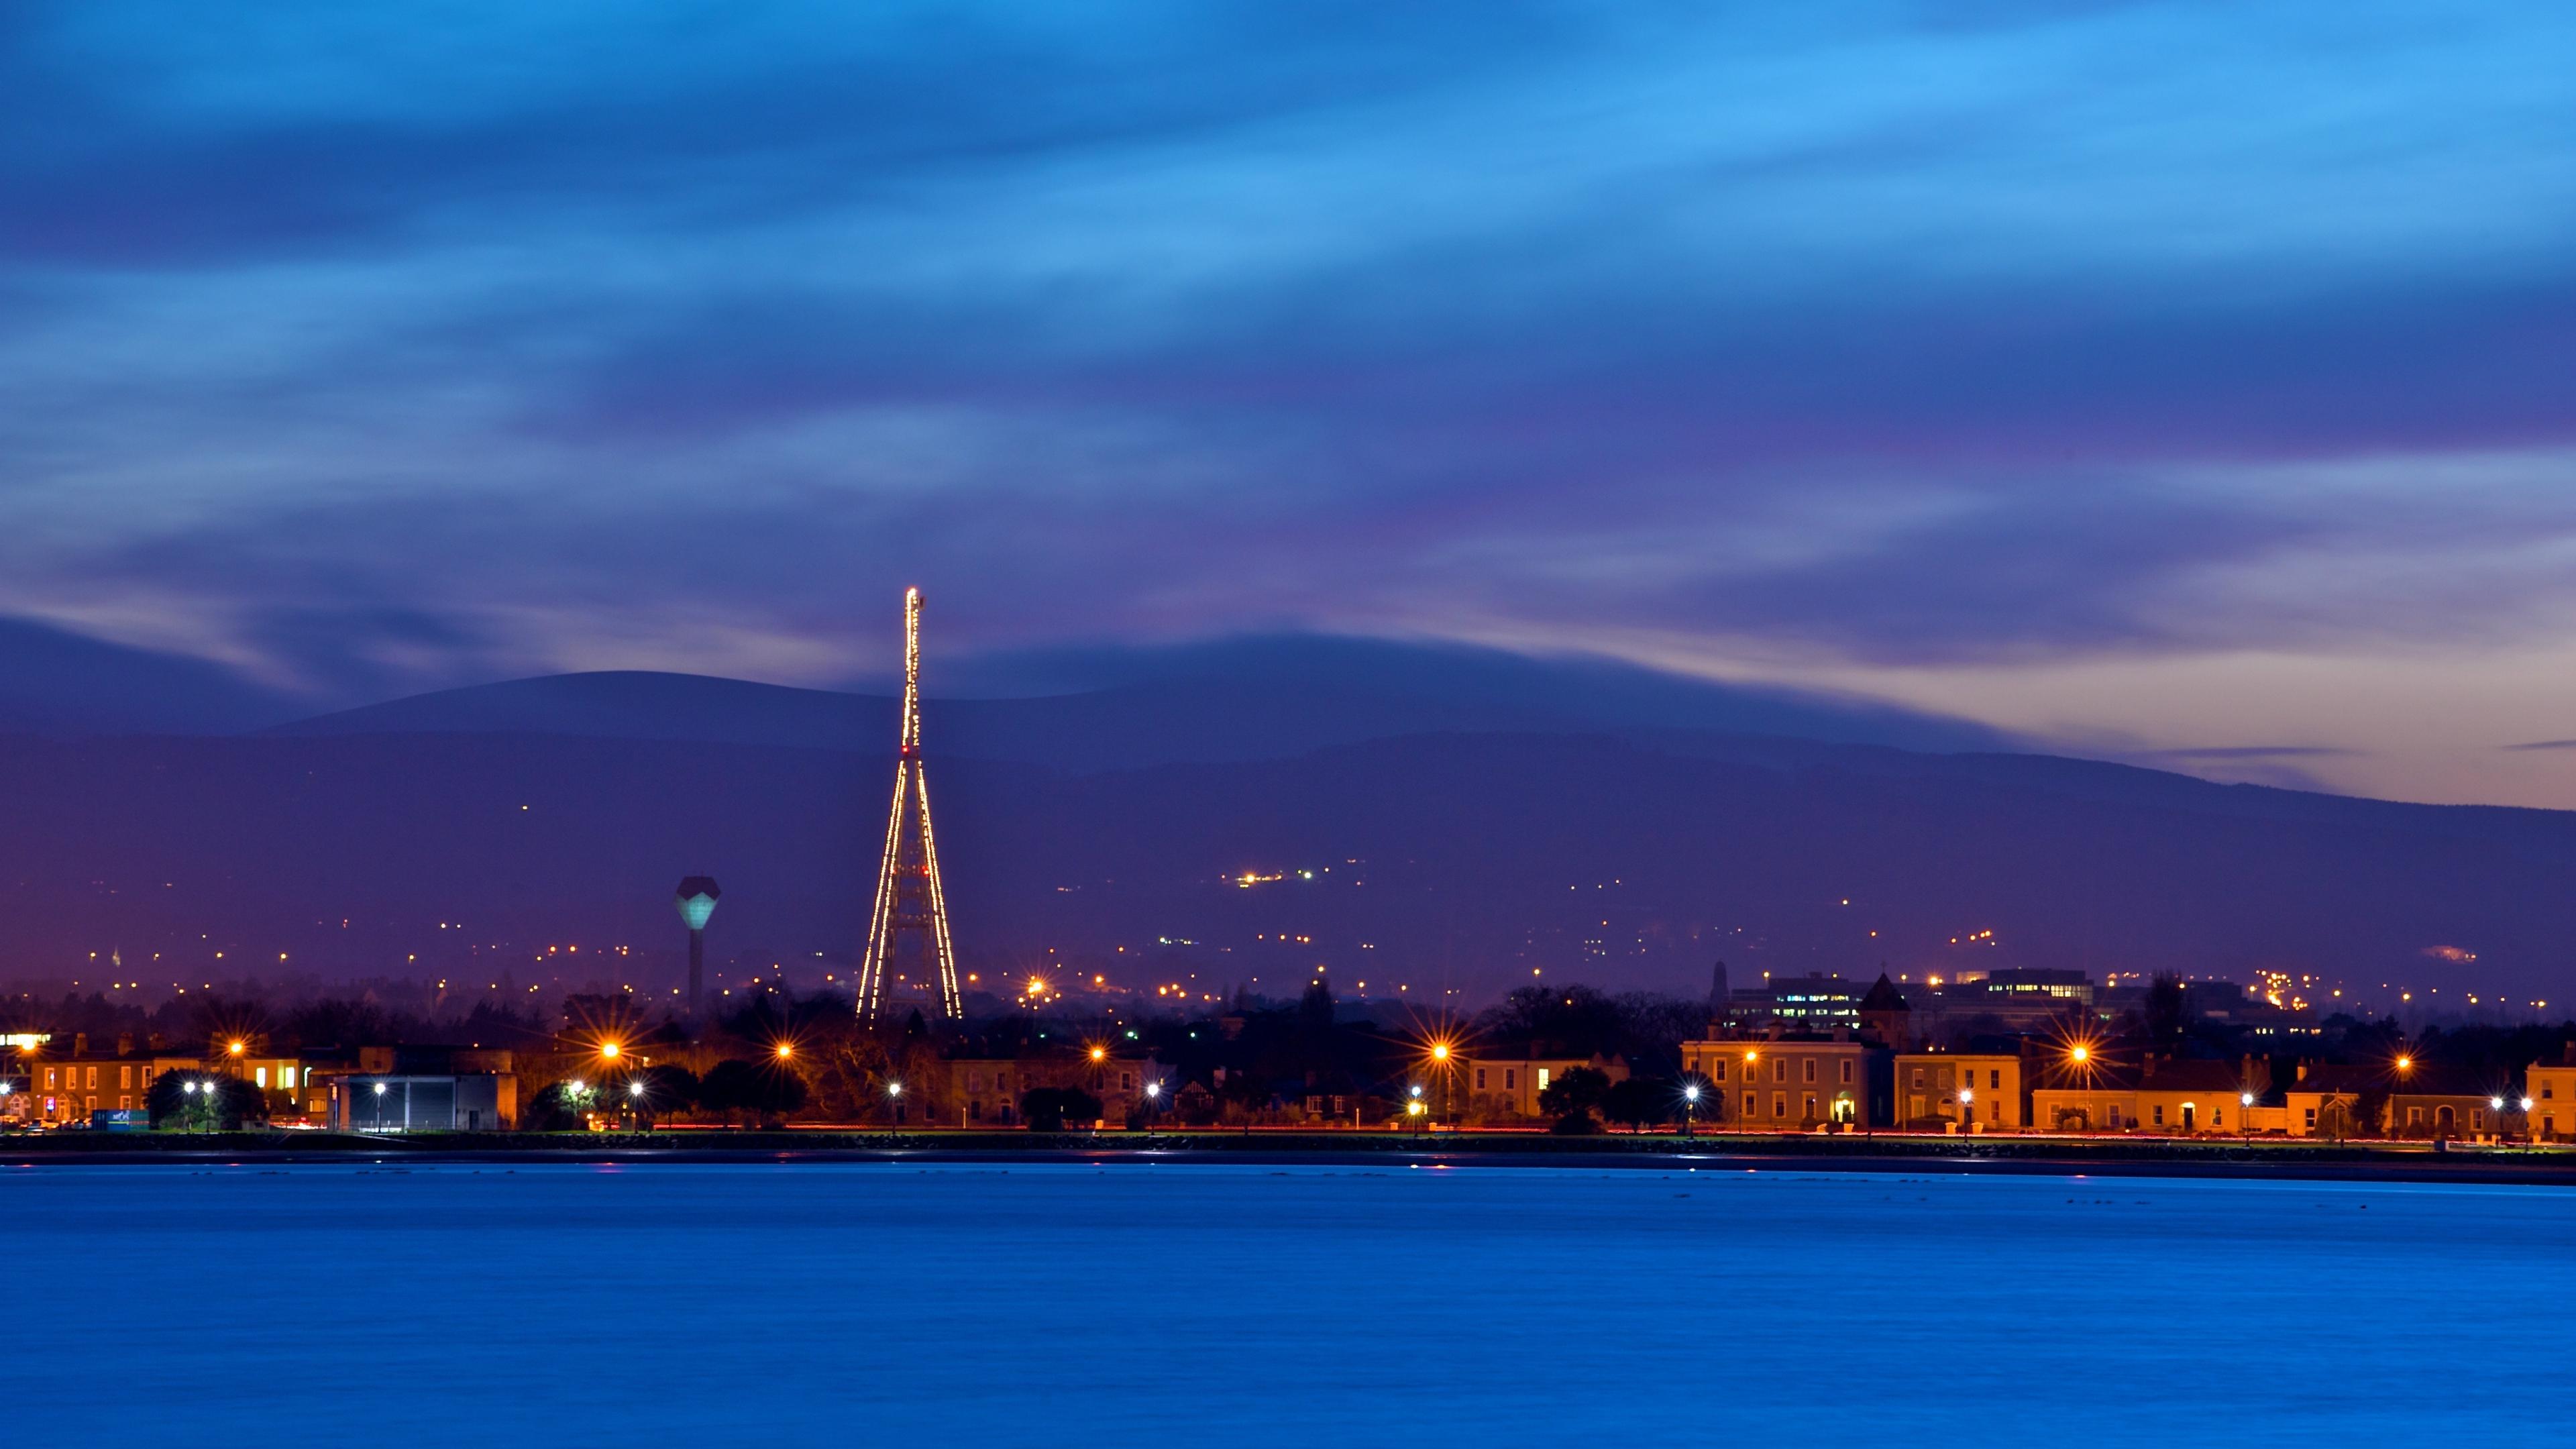 ireland dublin evening dusk sky blue clouds mountains houses lights quay river 4k 1538065666 - ireland, dublin, evening, dusk, sky, blue, clouds, mountains, houses, lights, quay, river 4k - Ireland, Evening, dublin